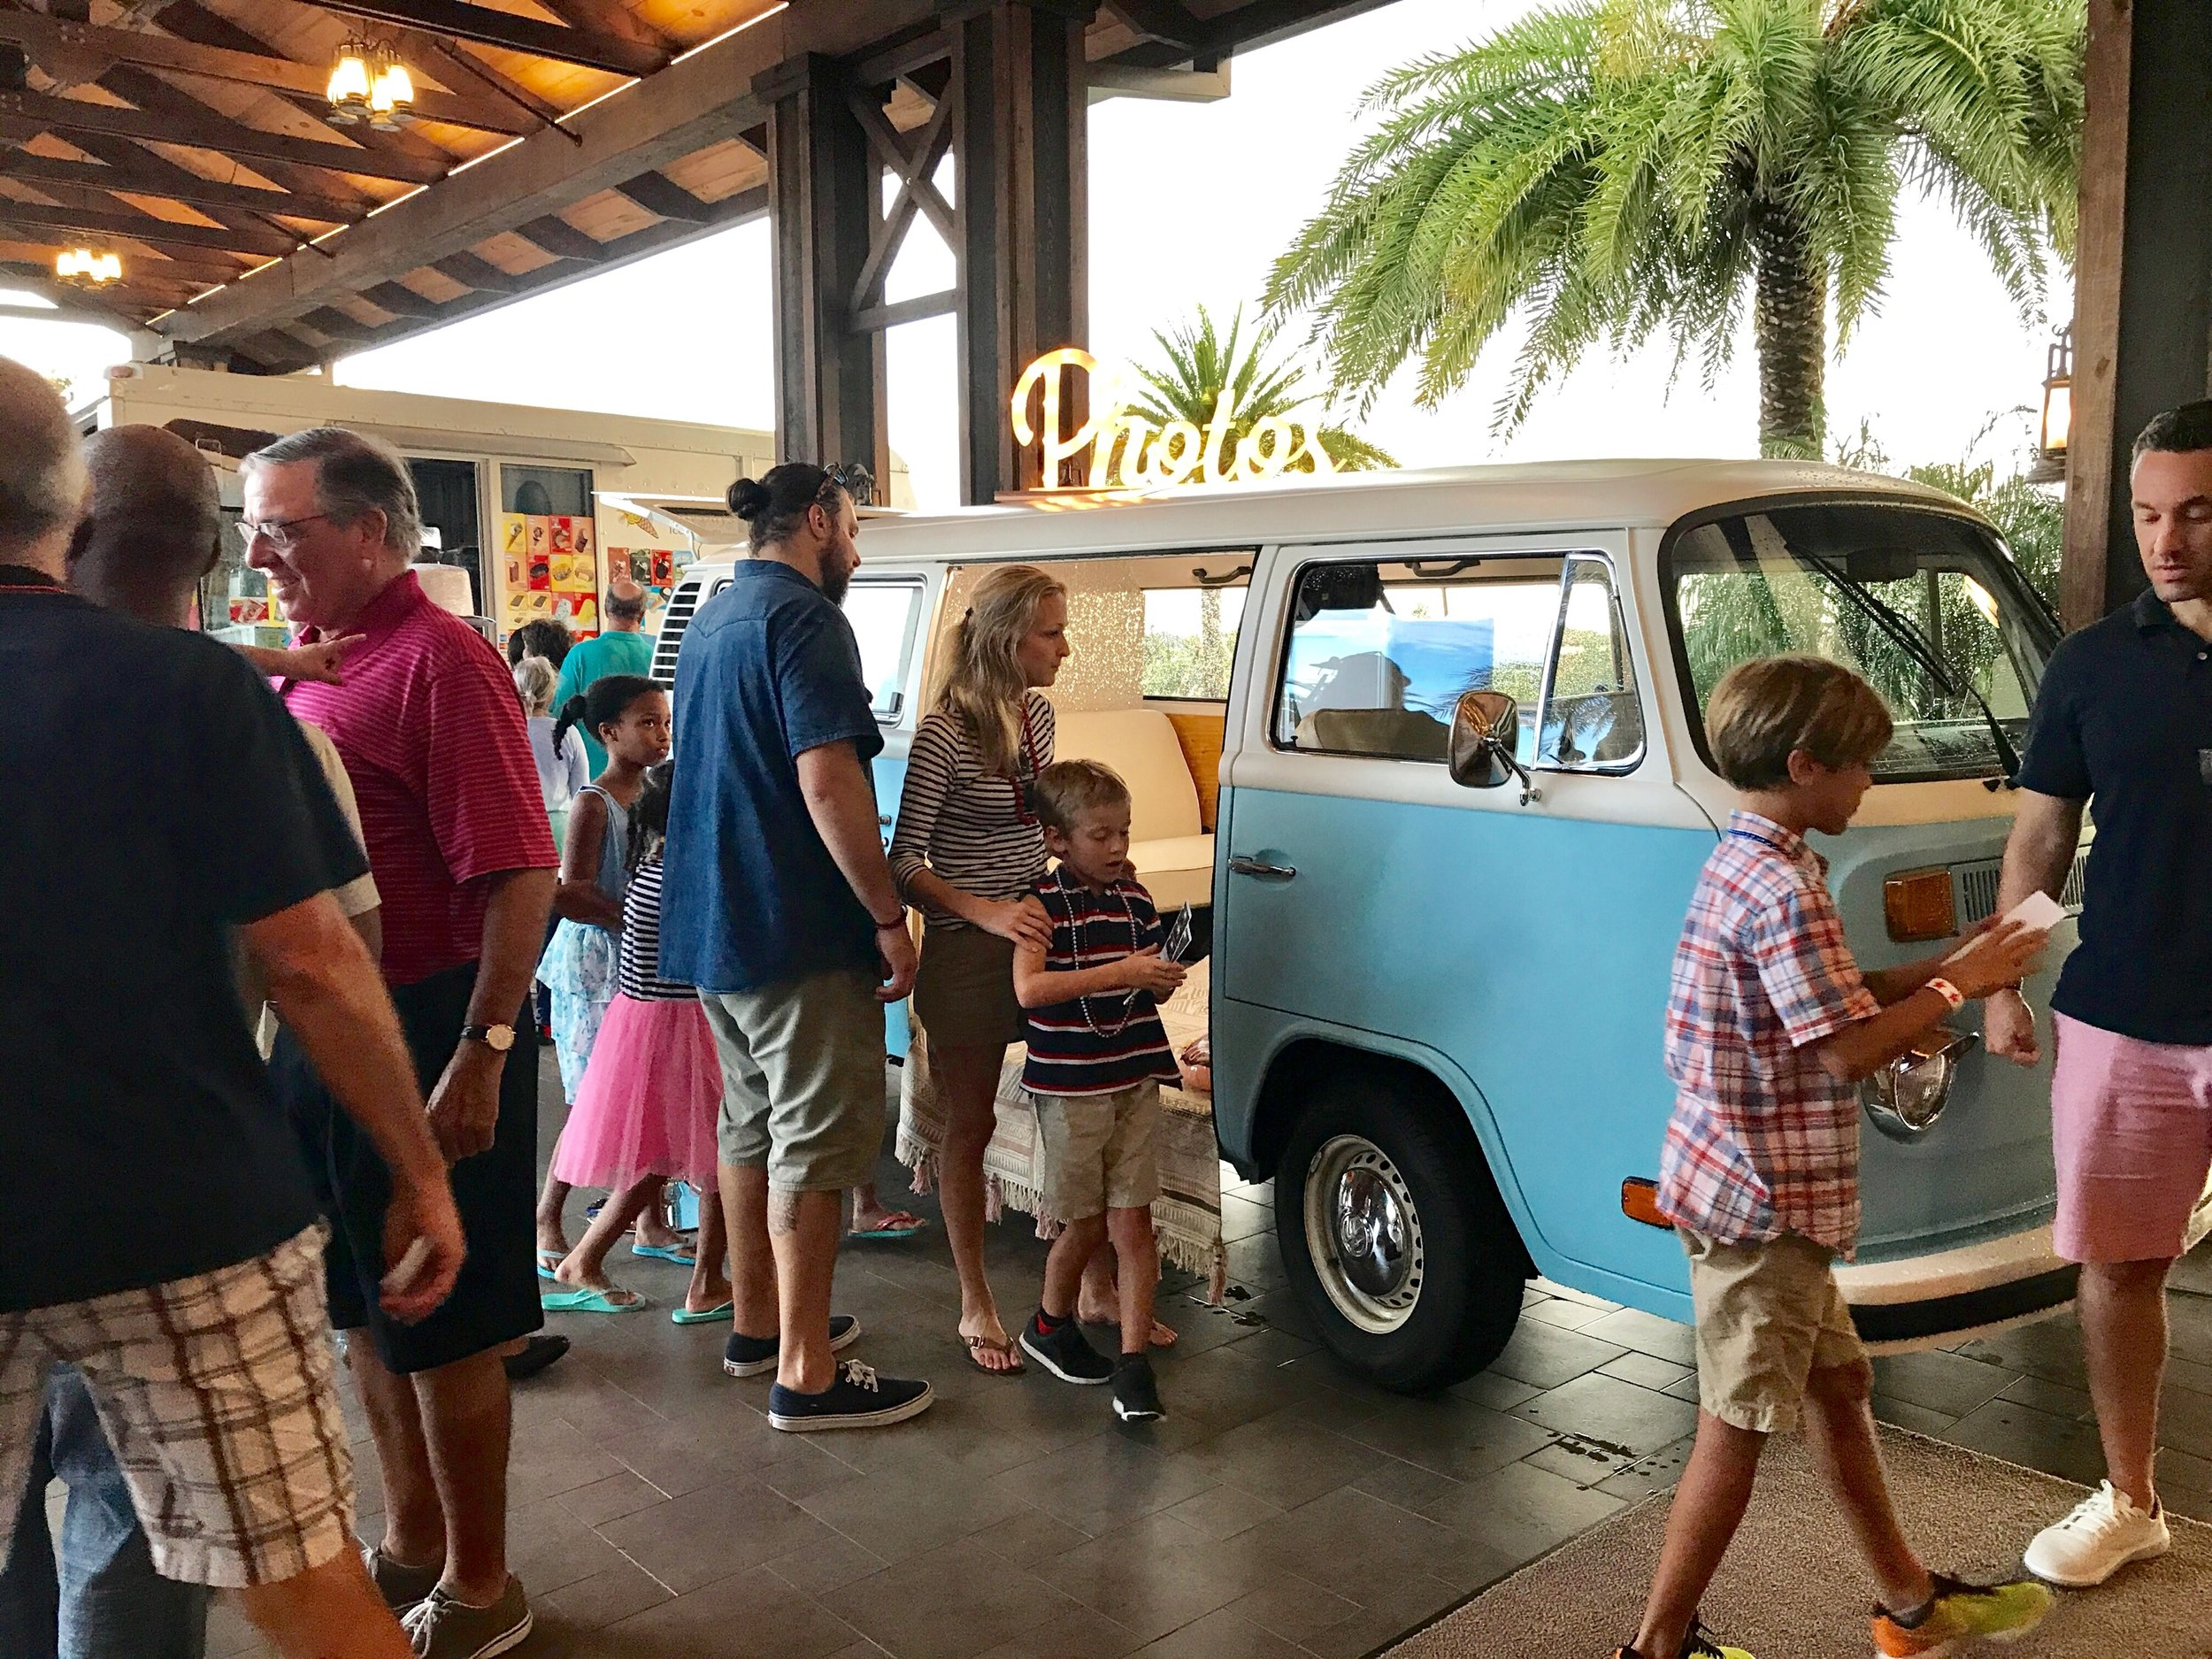 VW Photo Bus in Sarasota FL